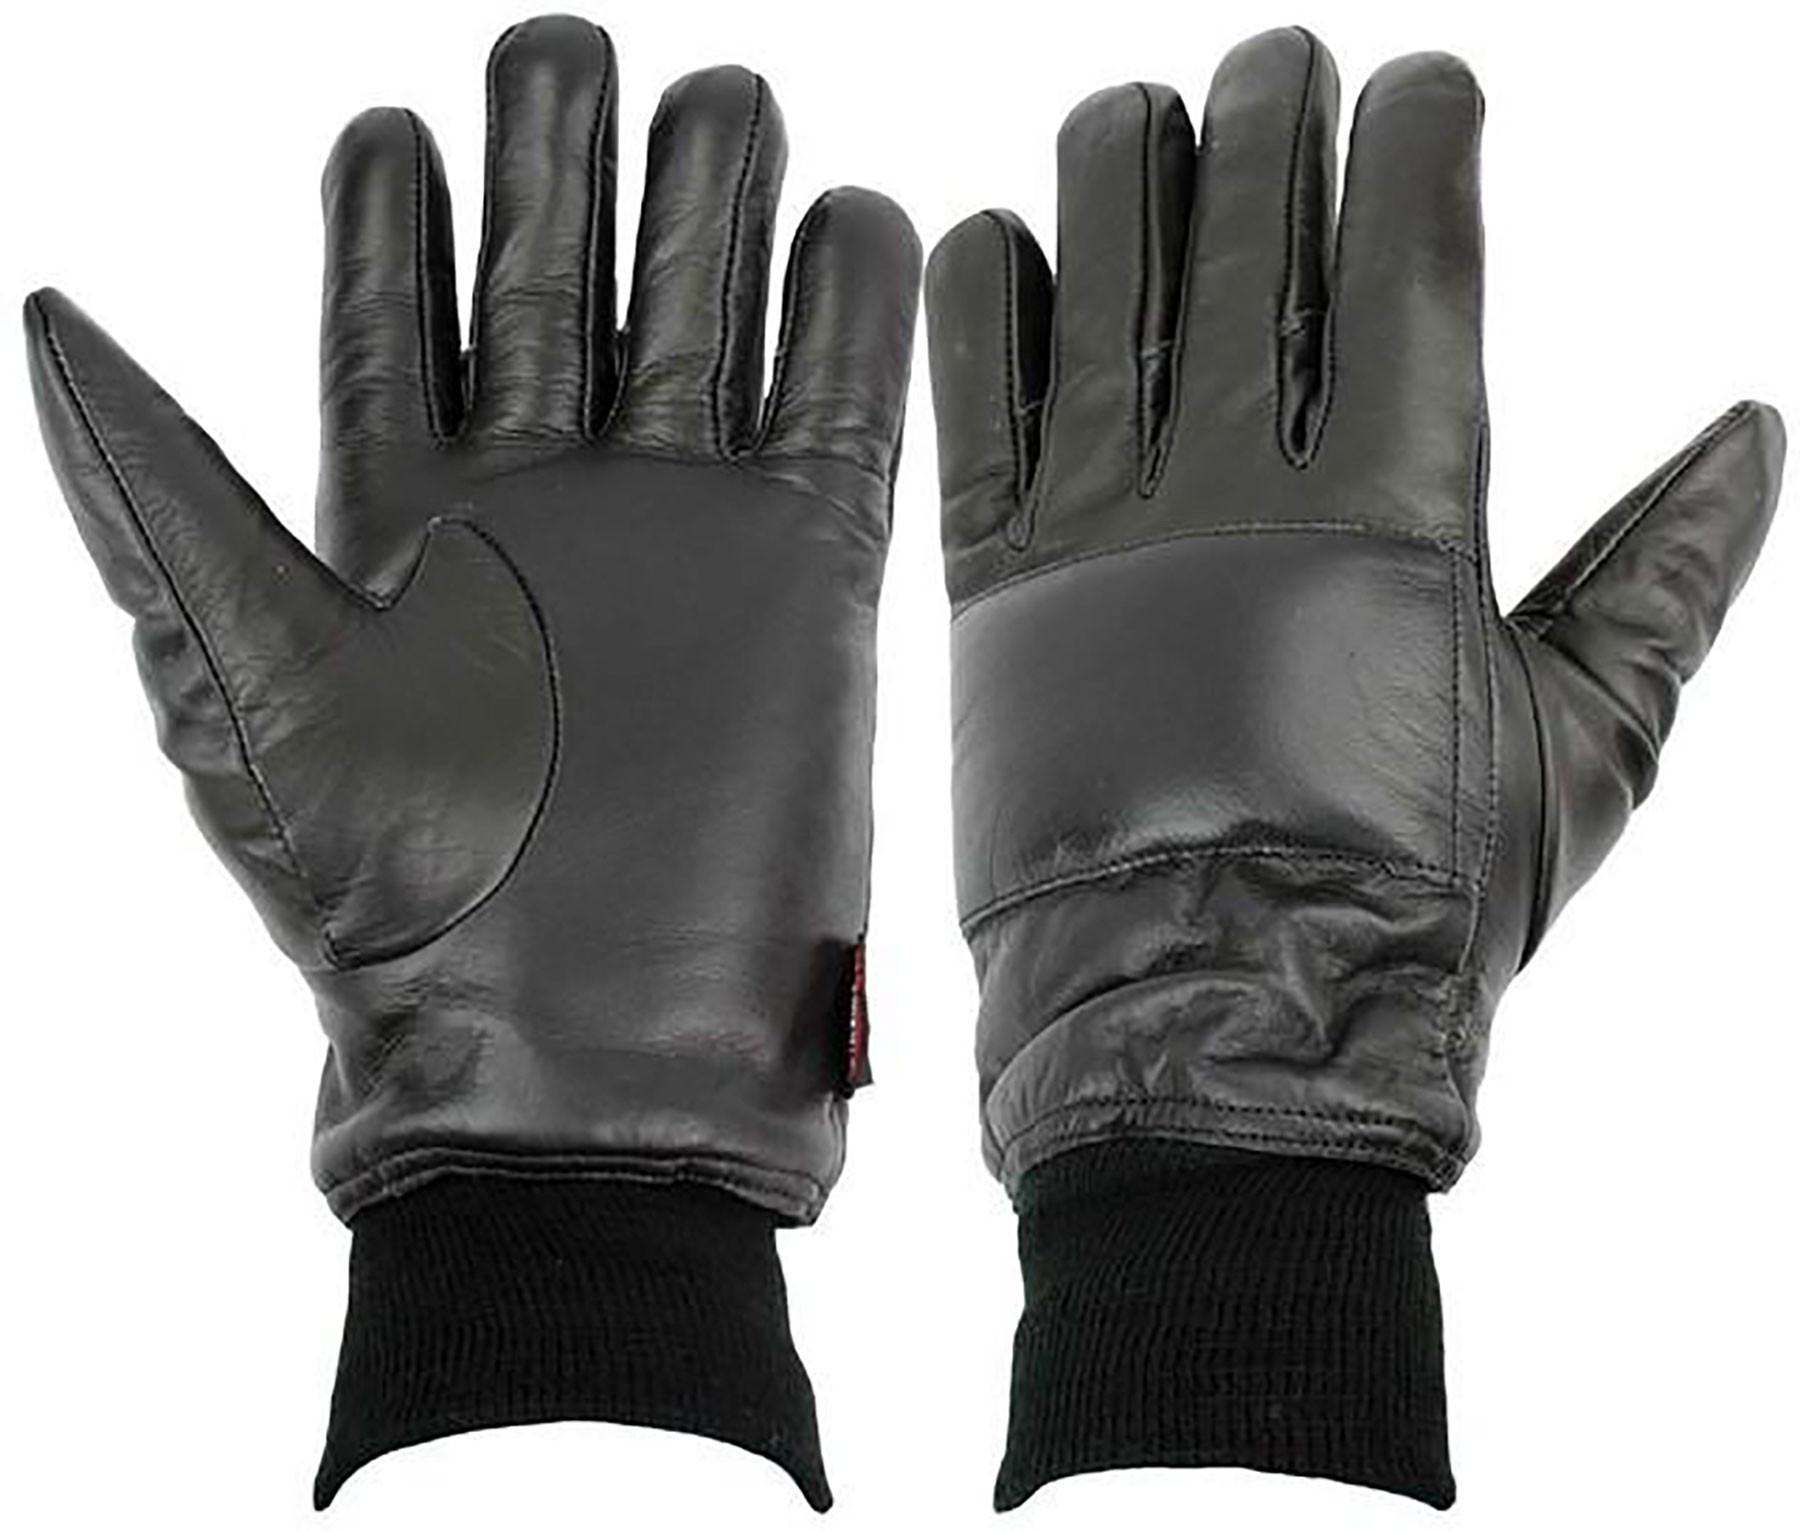 British Military Northern Ireland Gloves